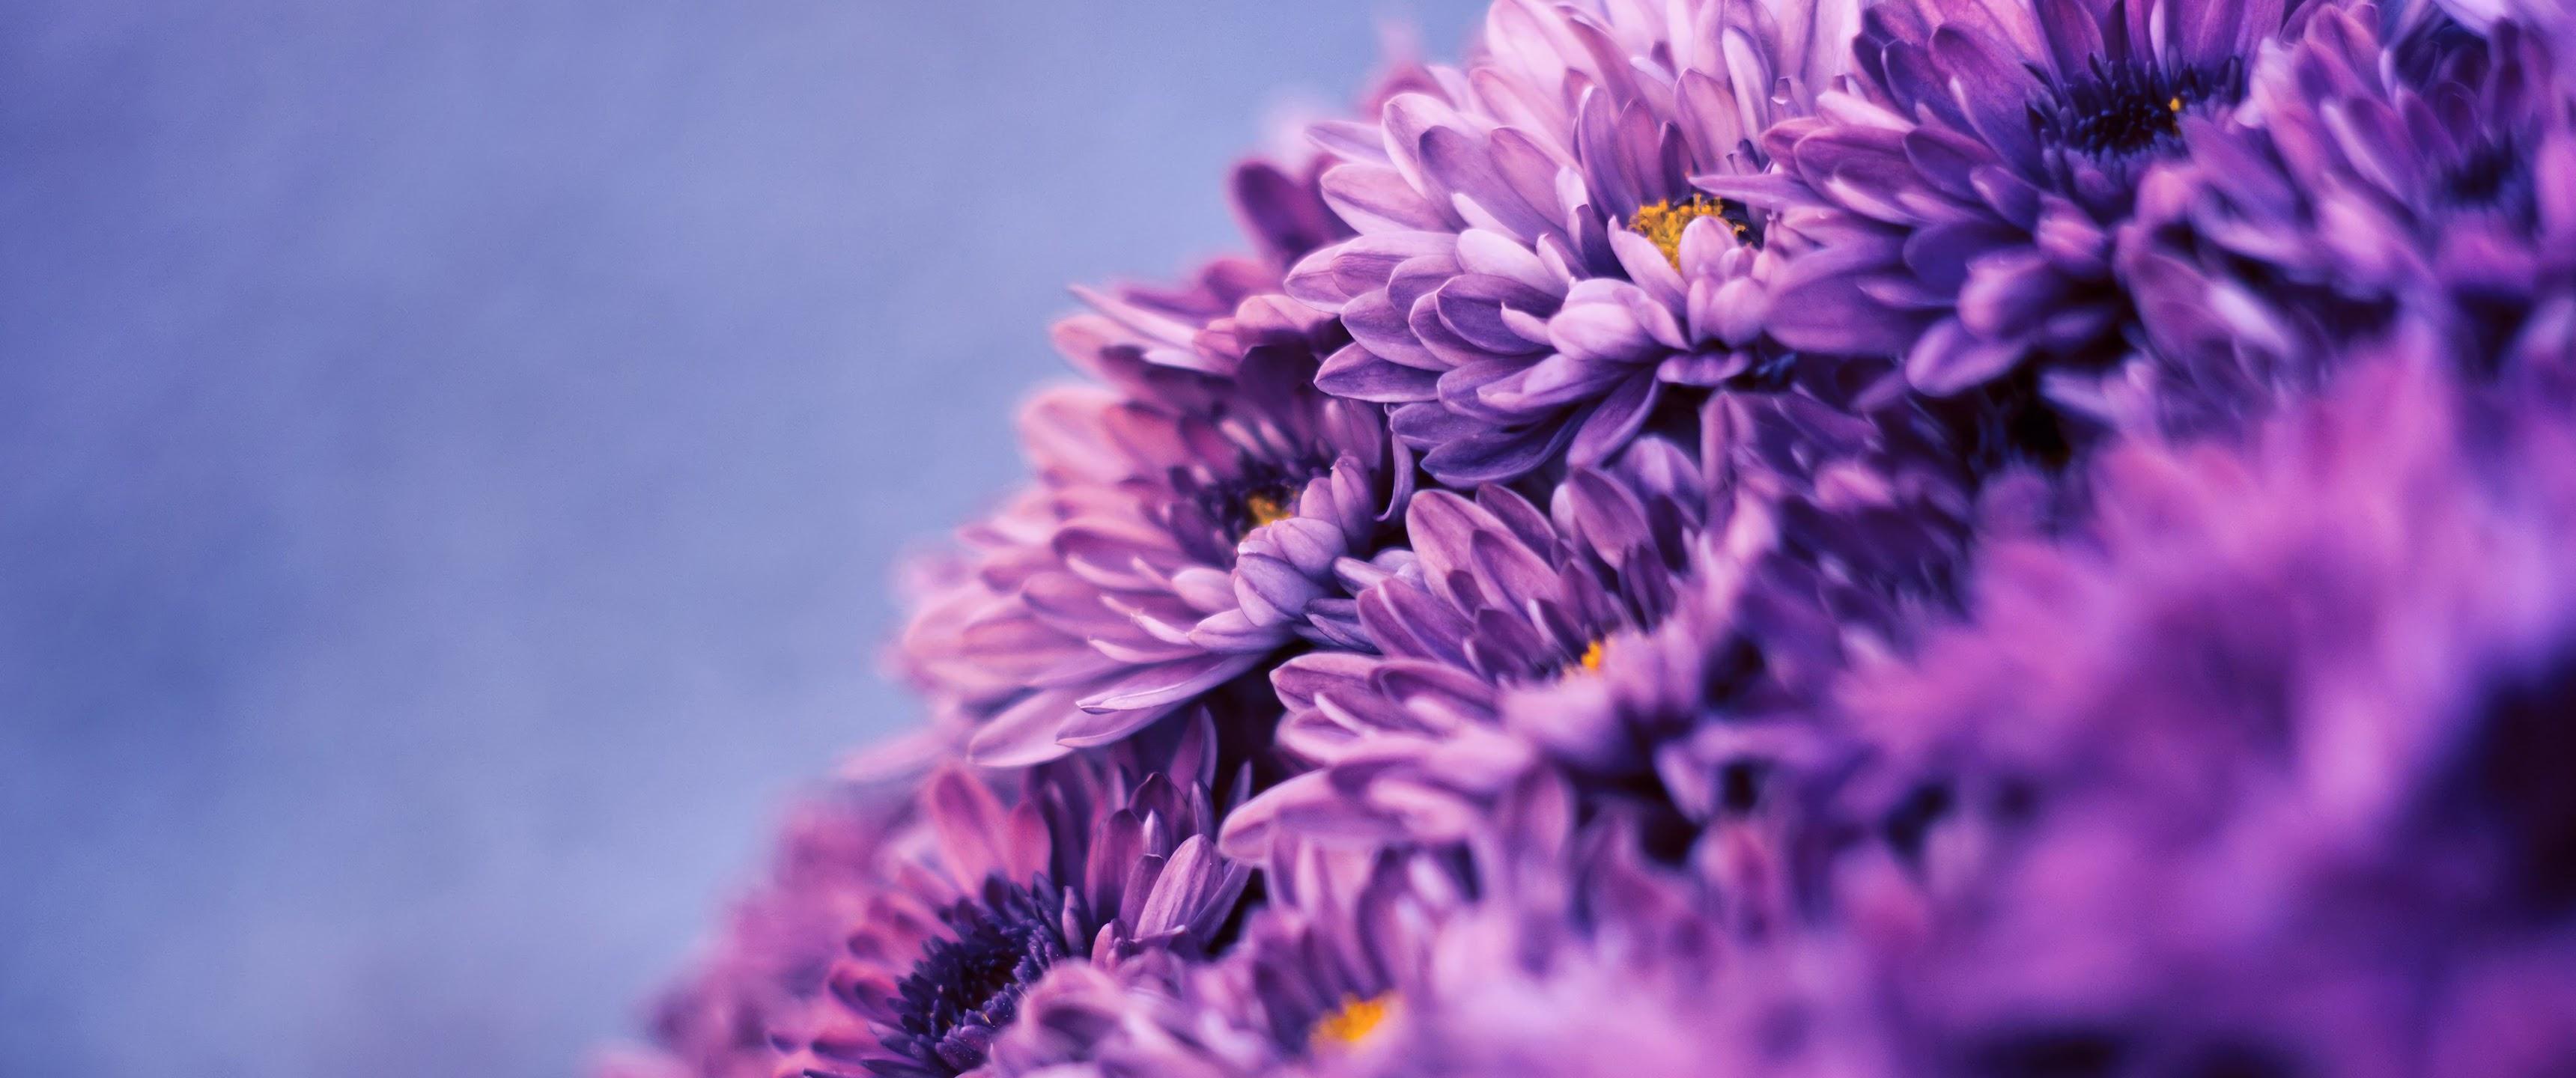 Purple Flower, Nature, 4K, 3840x2160, #86 Wallpaper